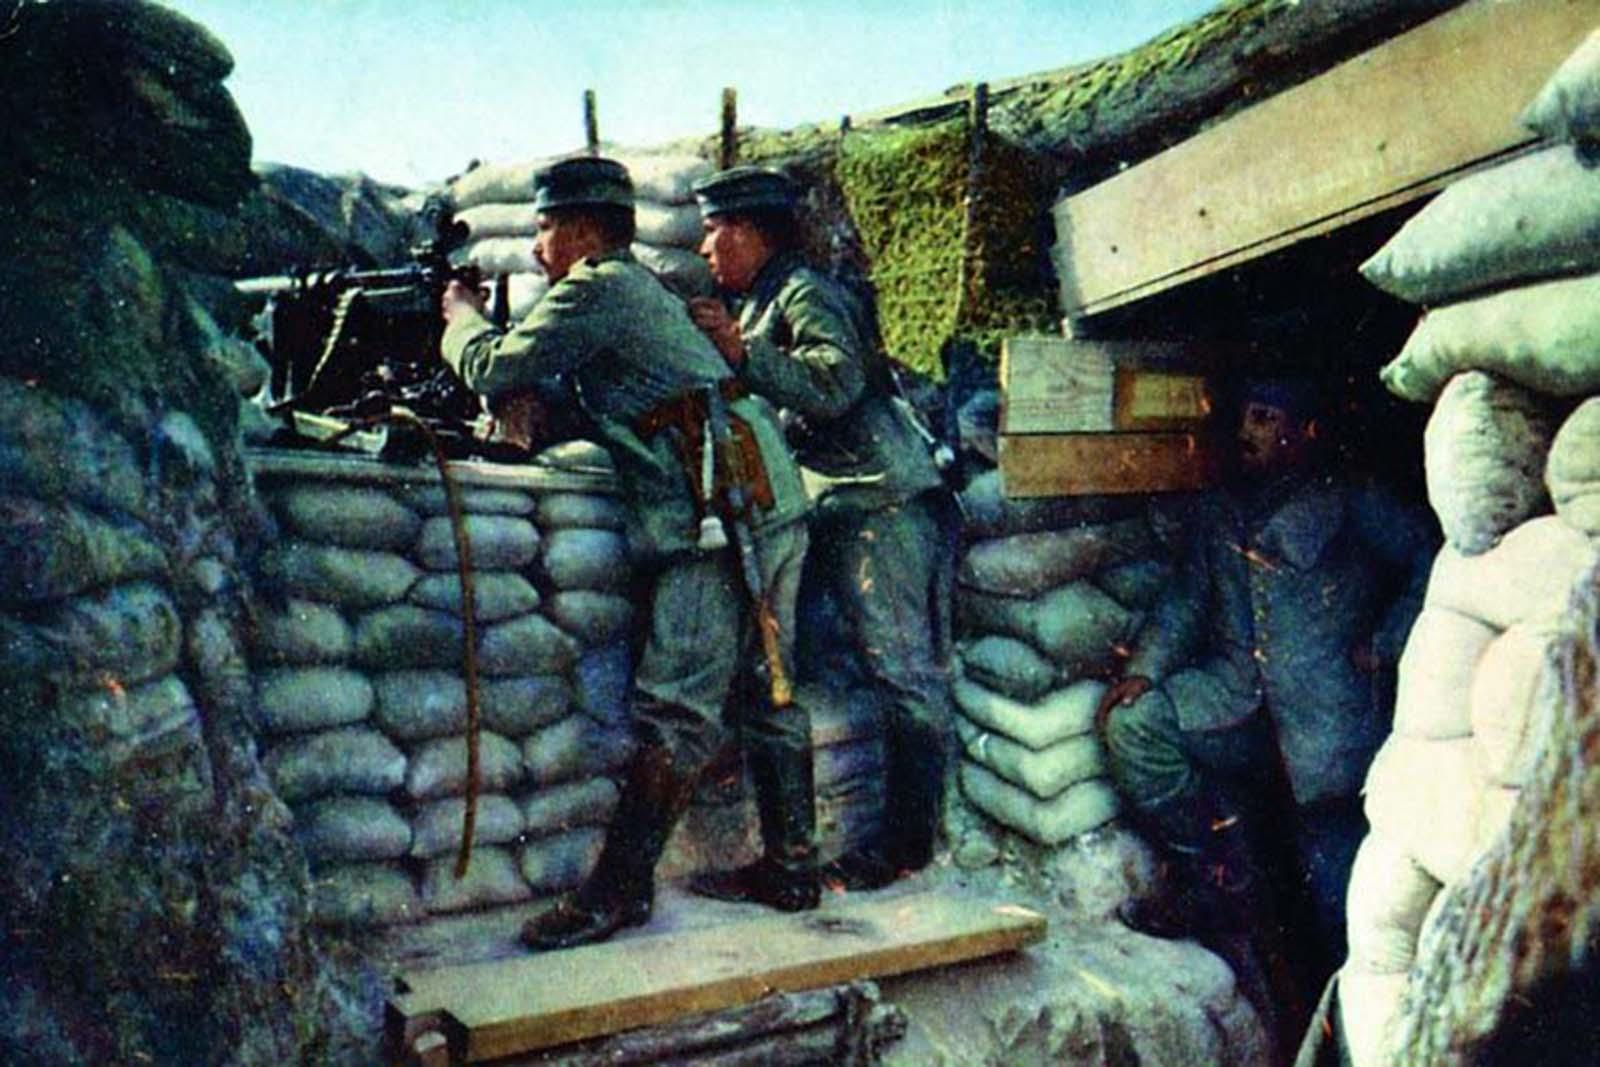 A German soldier posing with a machine gun.